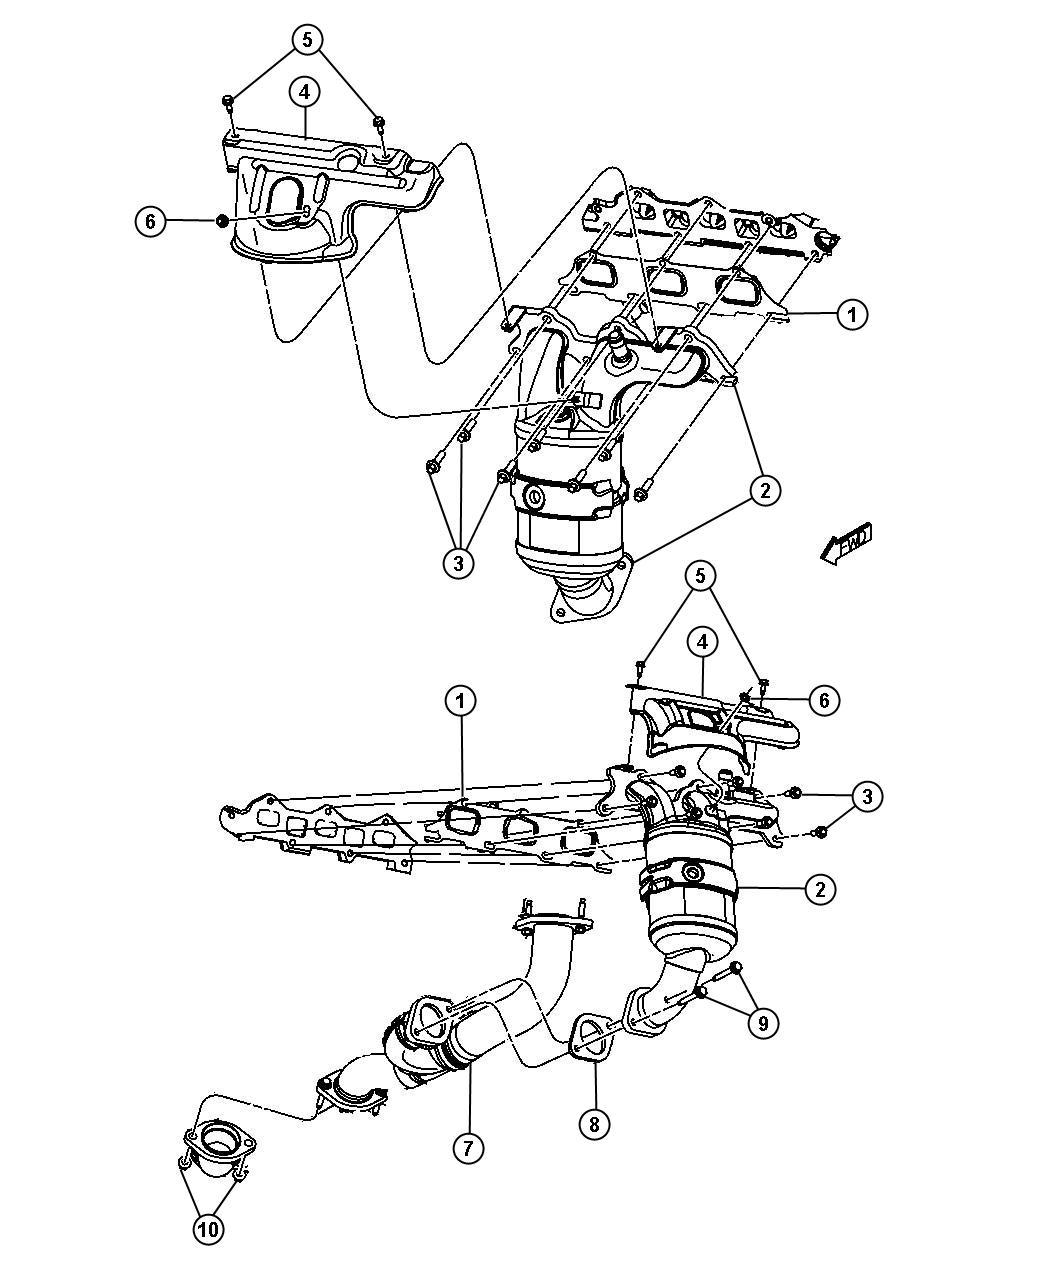 Chrysler 200 Gasket Crossunder Pipe Exhaust Pipe